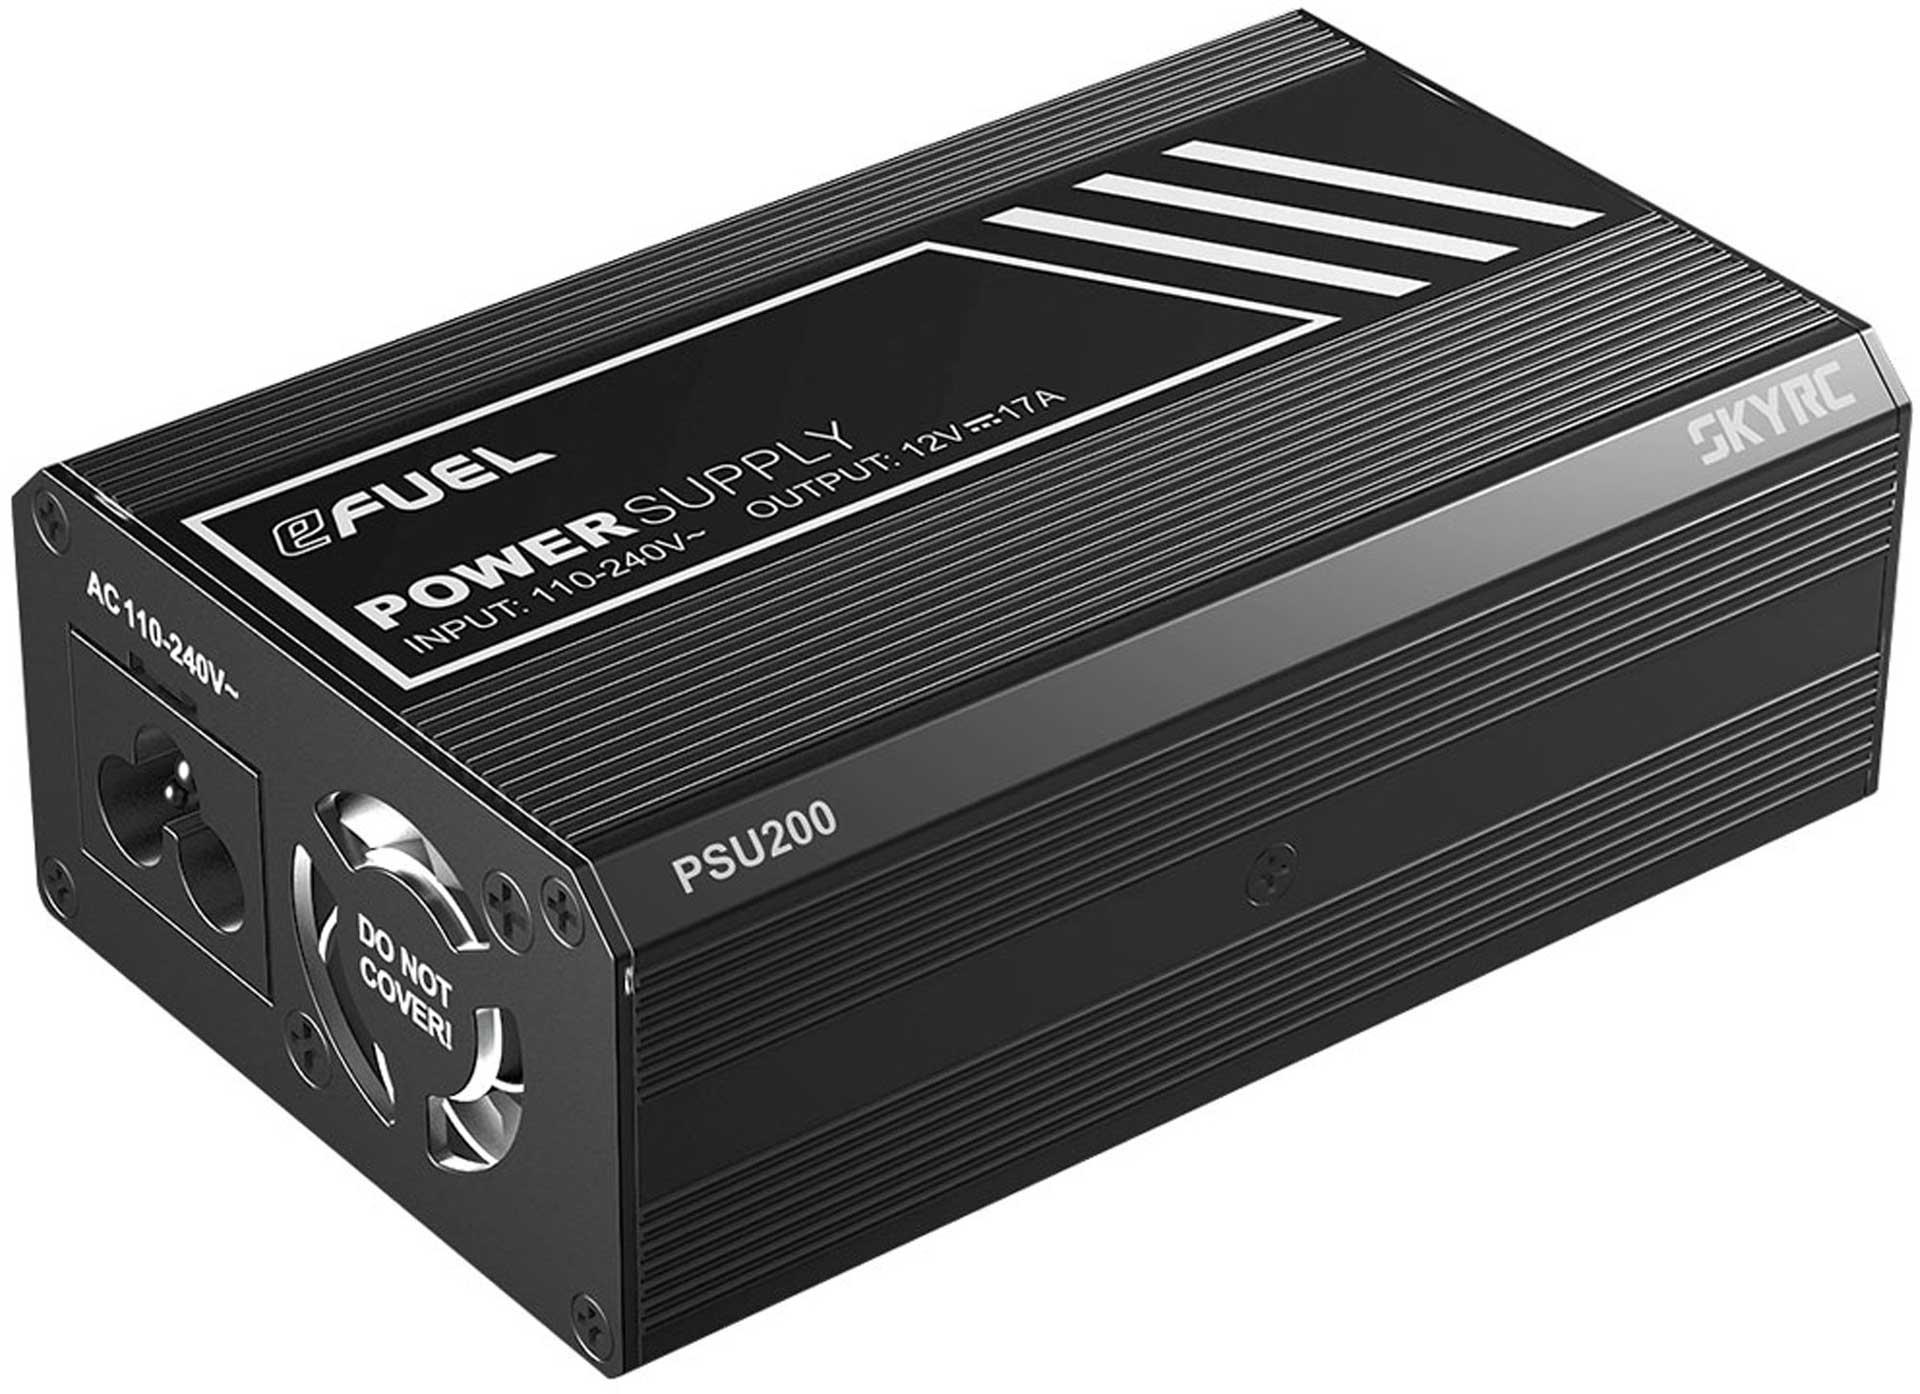 SKYRC POWER SUPPLY 200W PSU 12 VOLT 17 AMP 110-240V XT60 OUTPUT